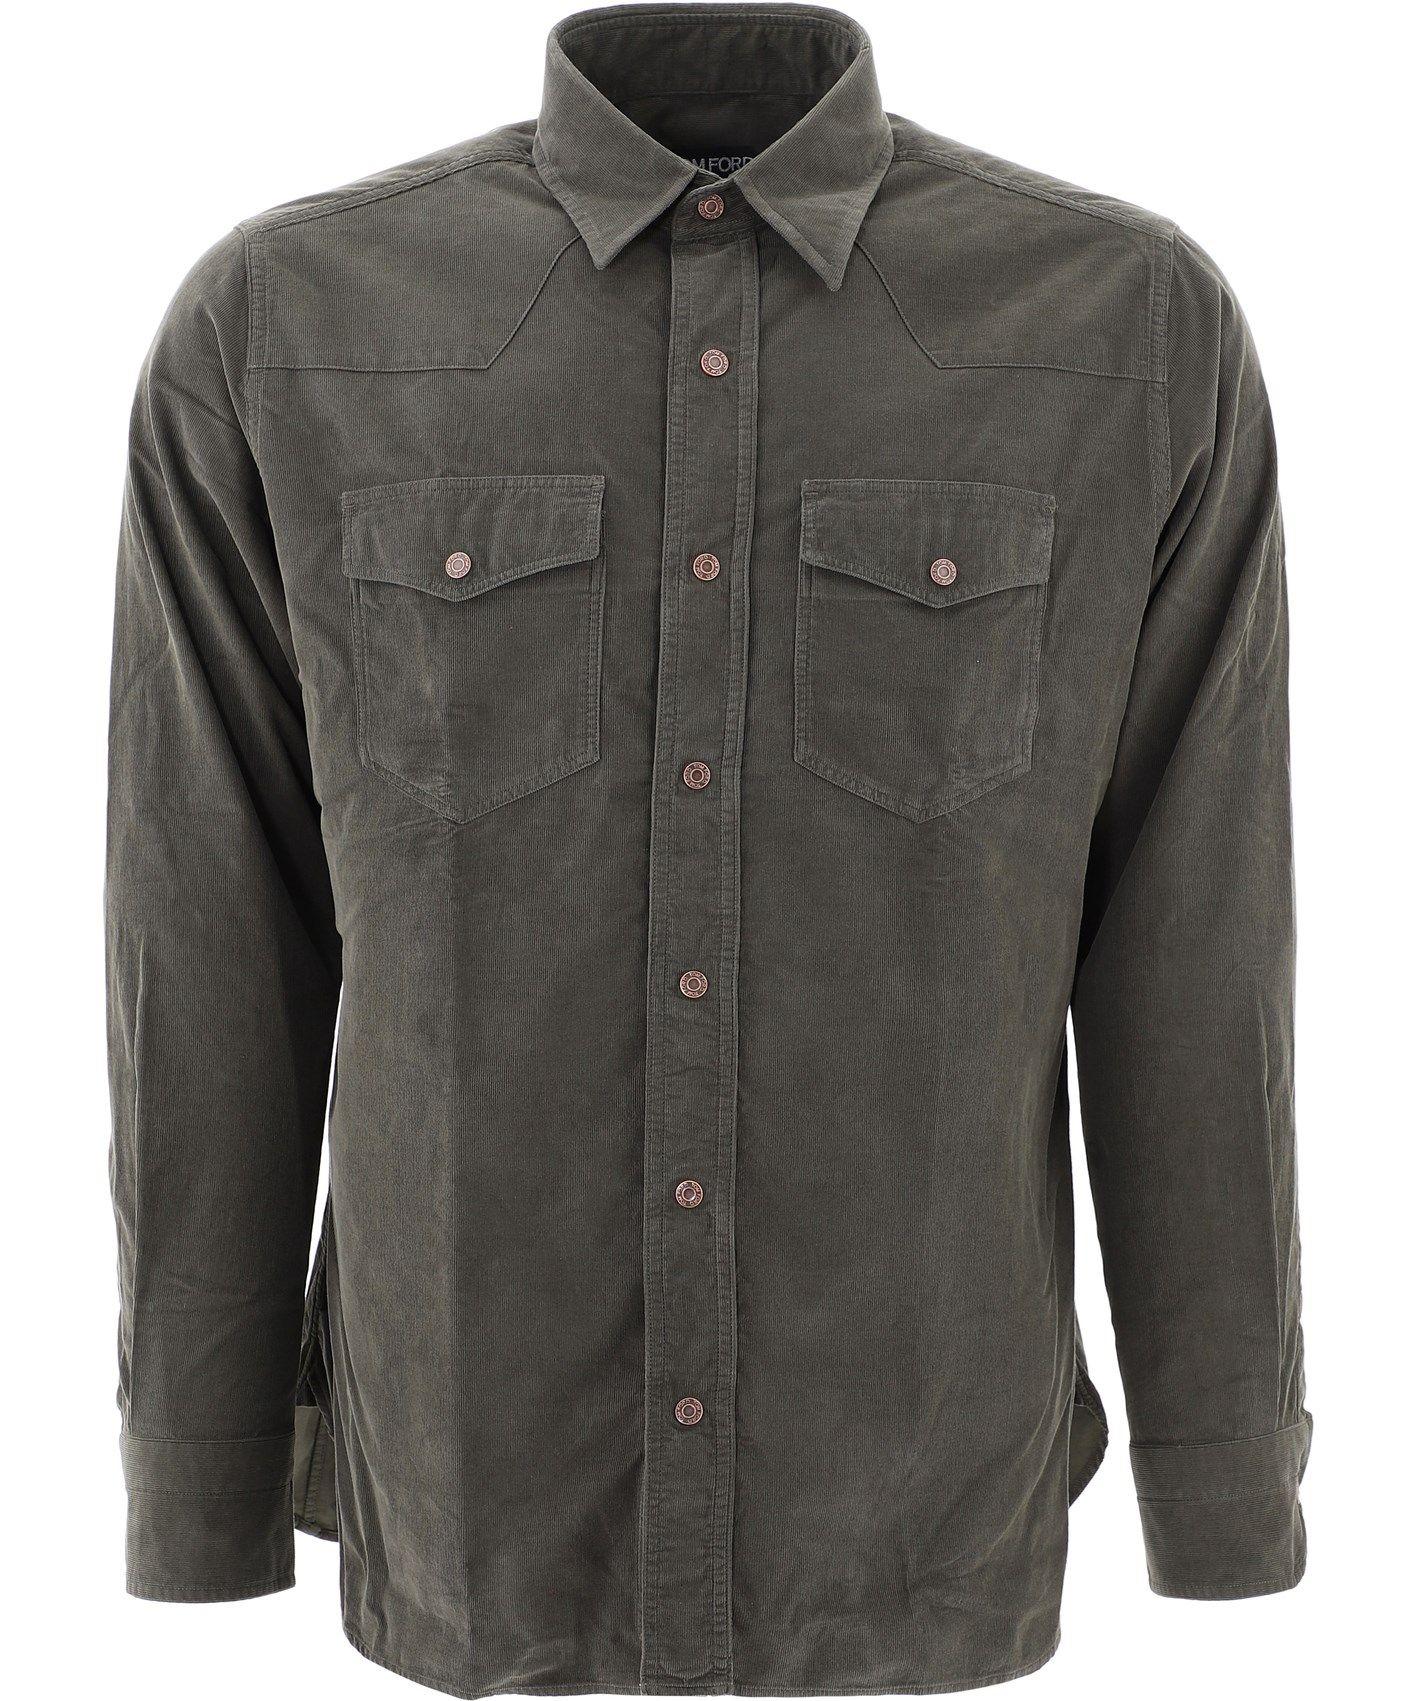 Tom Ford Men's Green Cotton Shirt